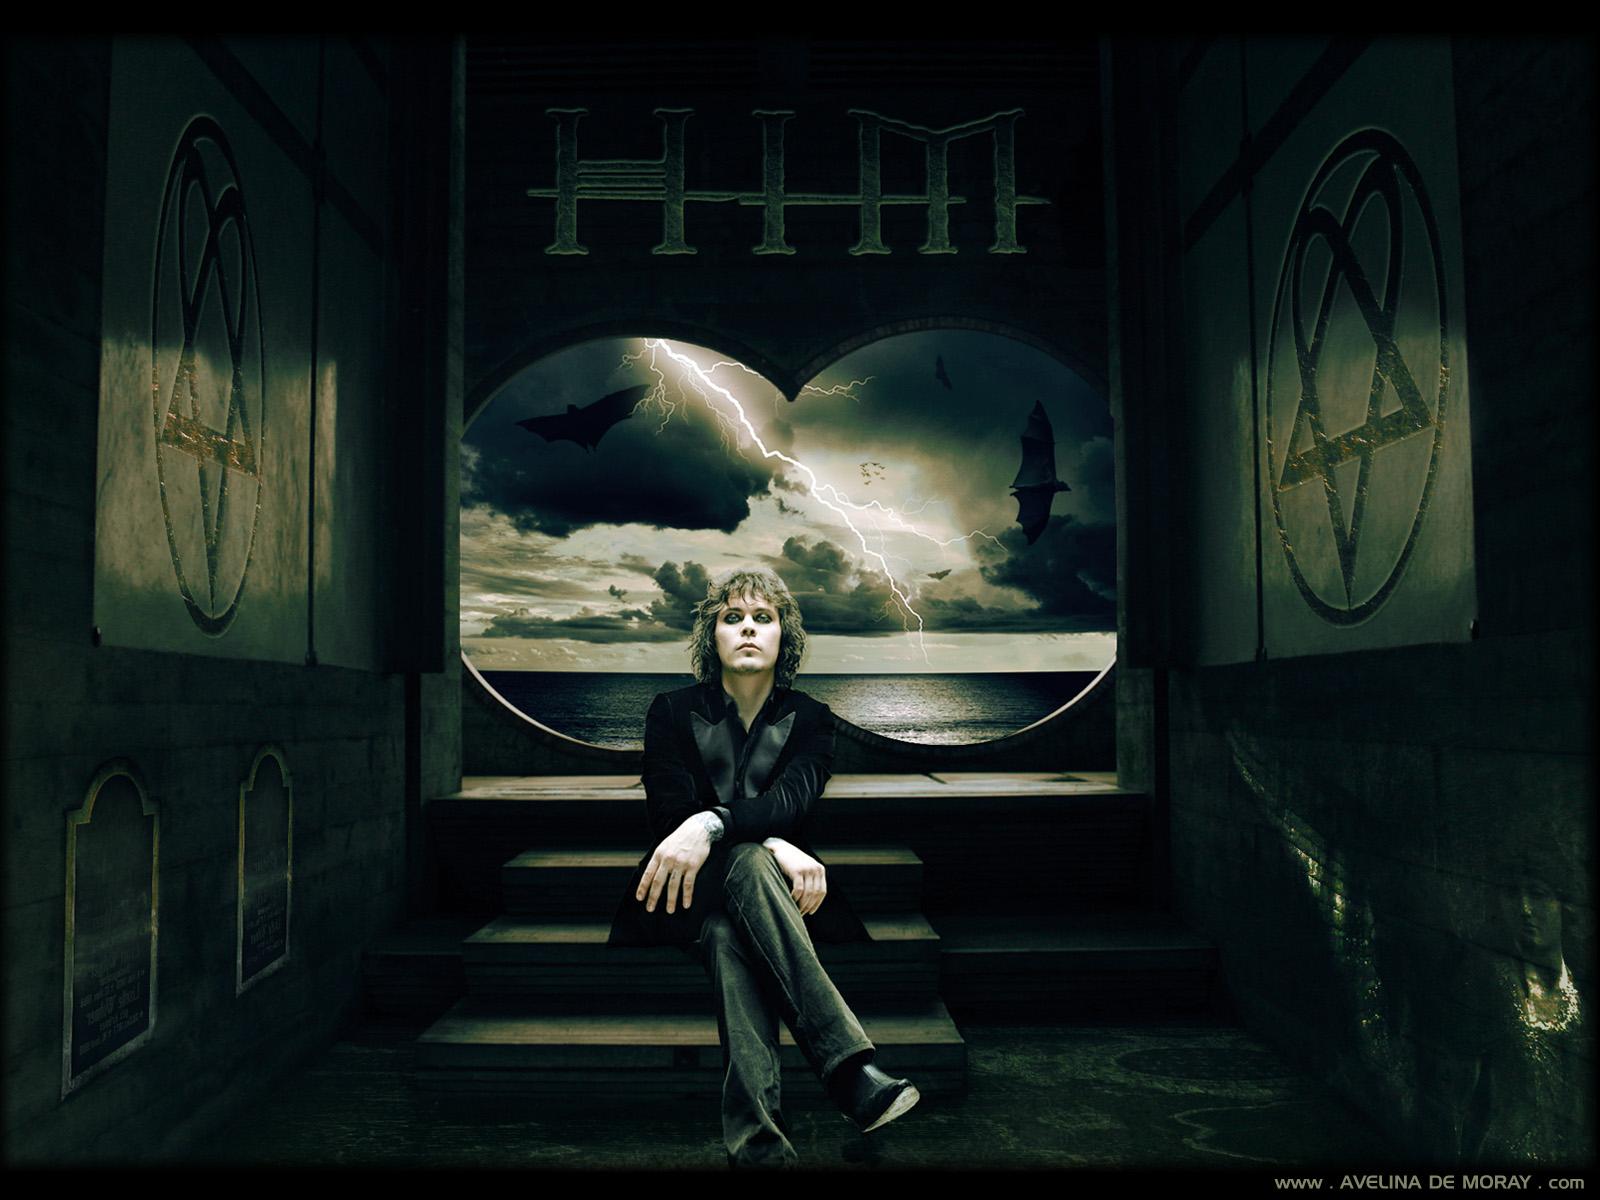 http://1.bp.blogspot.com/-lQCjoDV9QkM/UDTXywSnmsI/AAAAAAAAEL0/TFU8iwNeBJc/s1600/Him.jpg